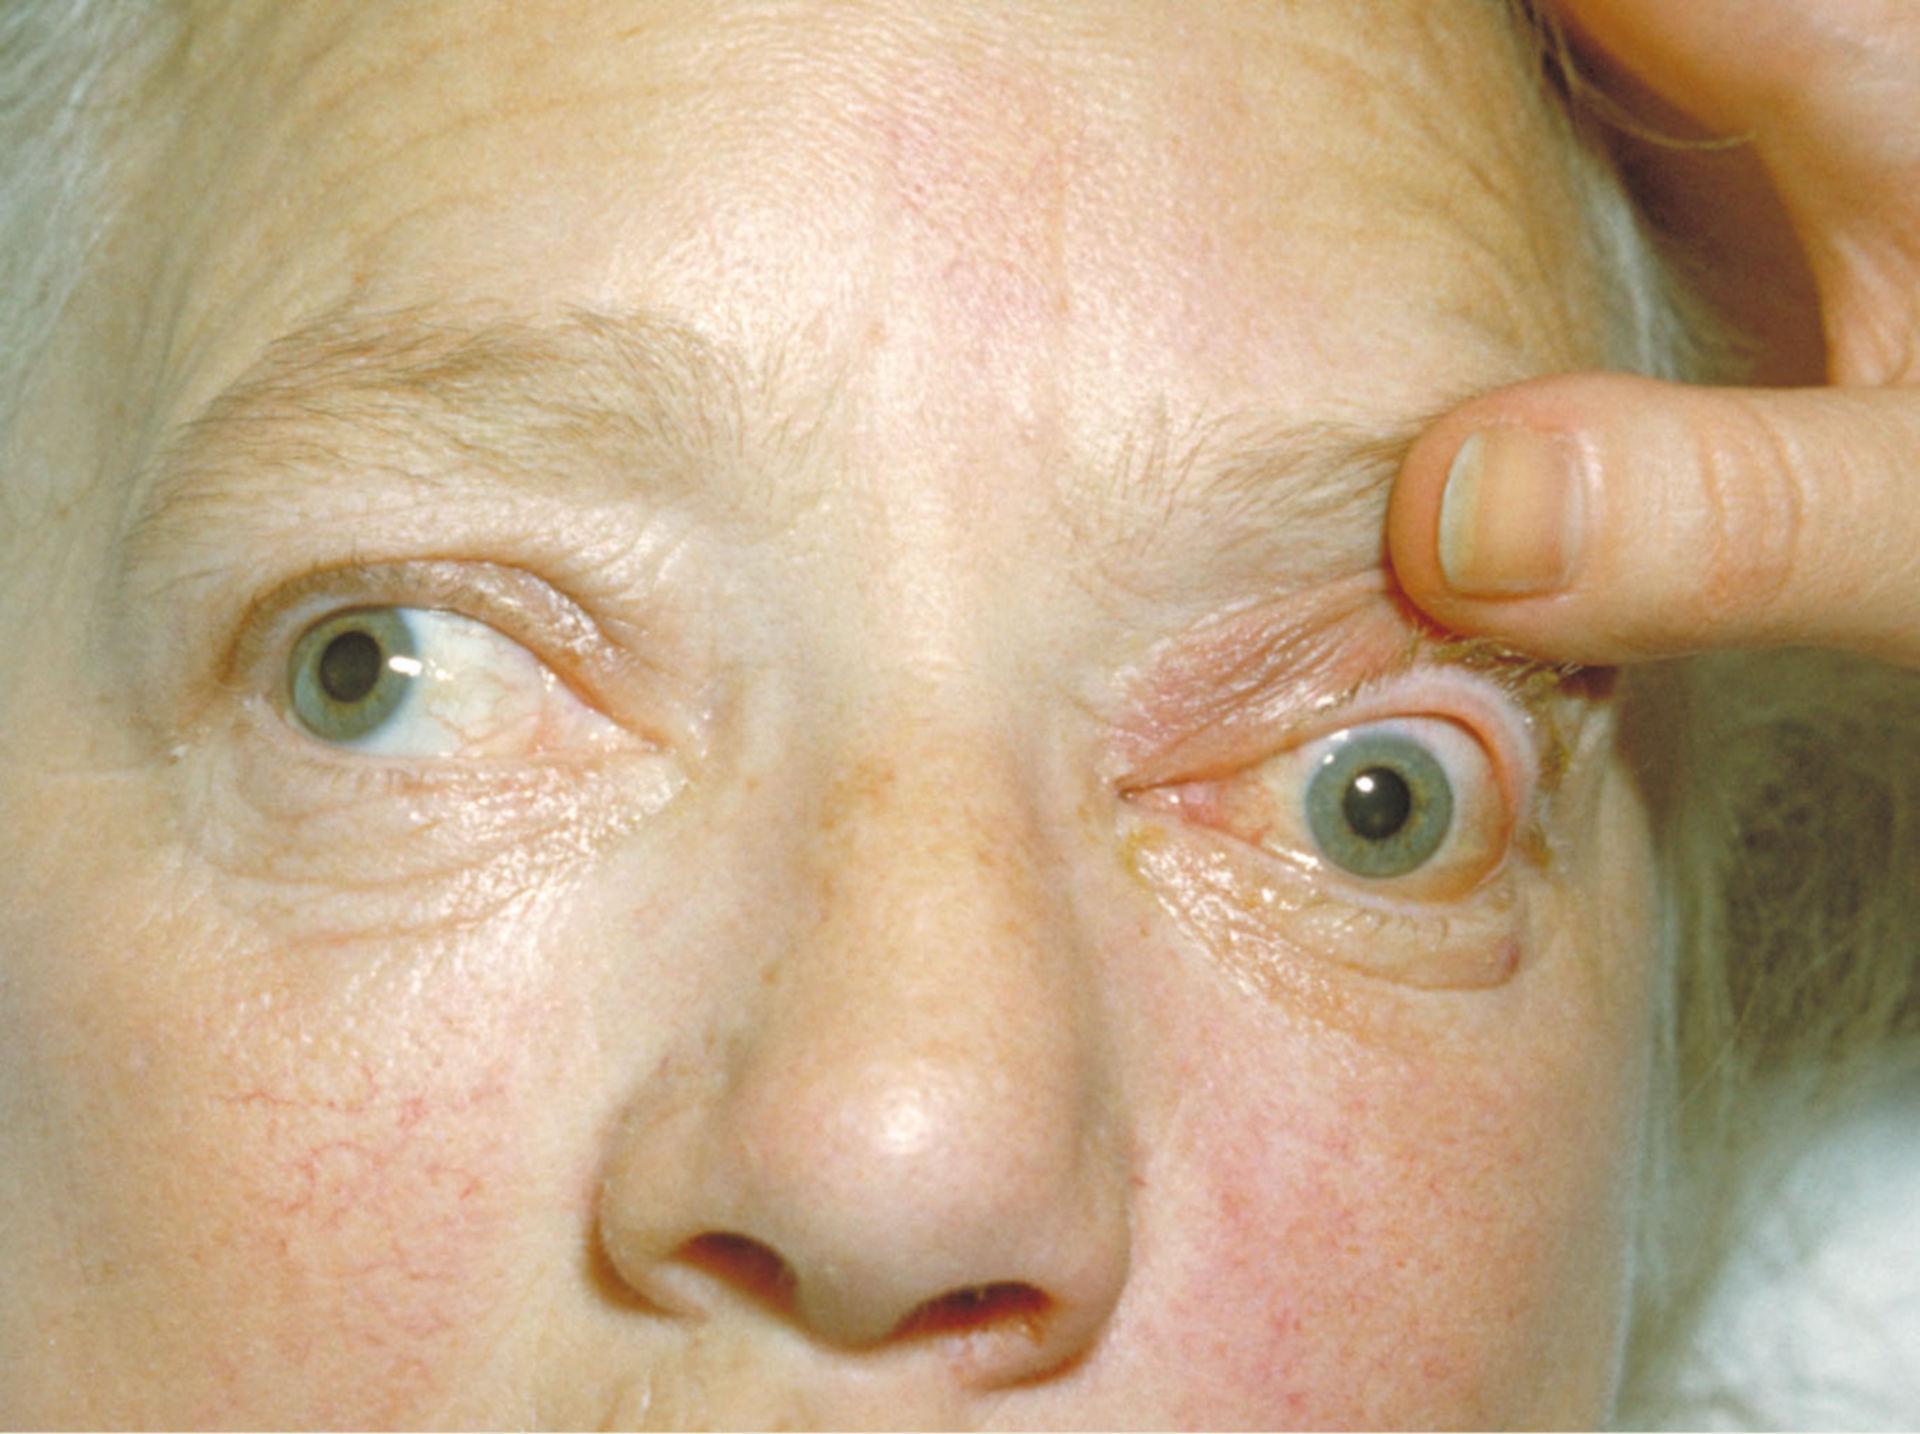 Bilateral exophthalmos